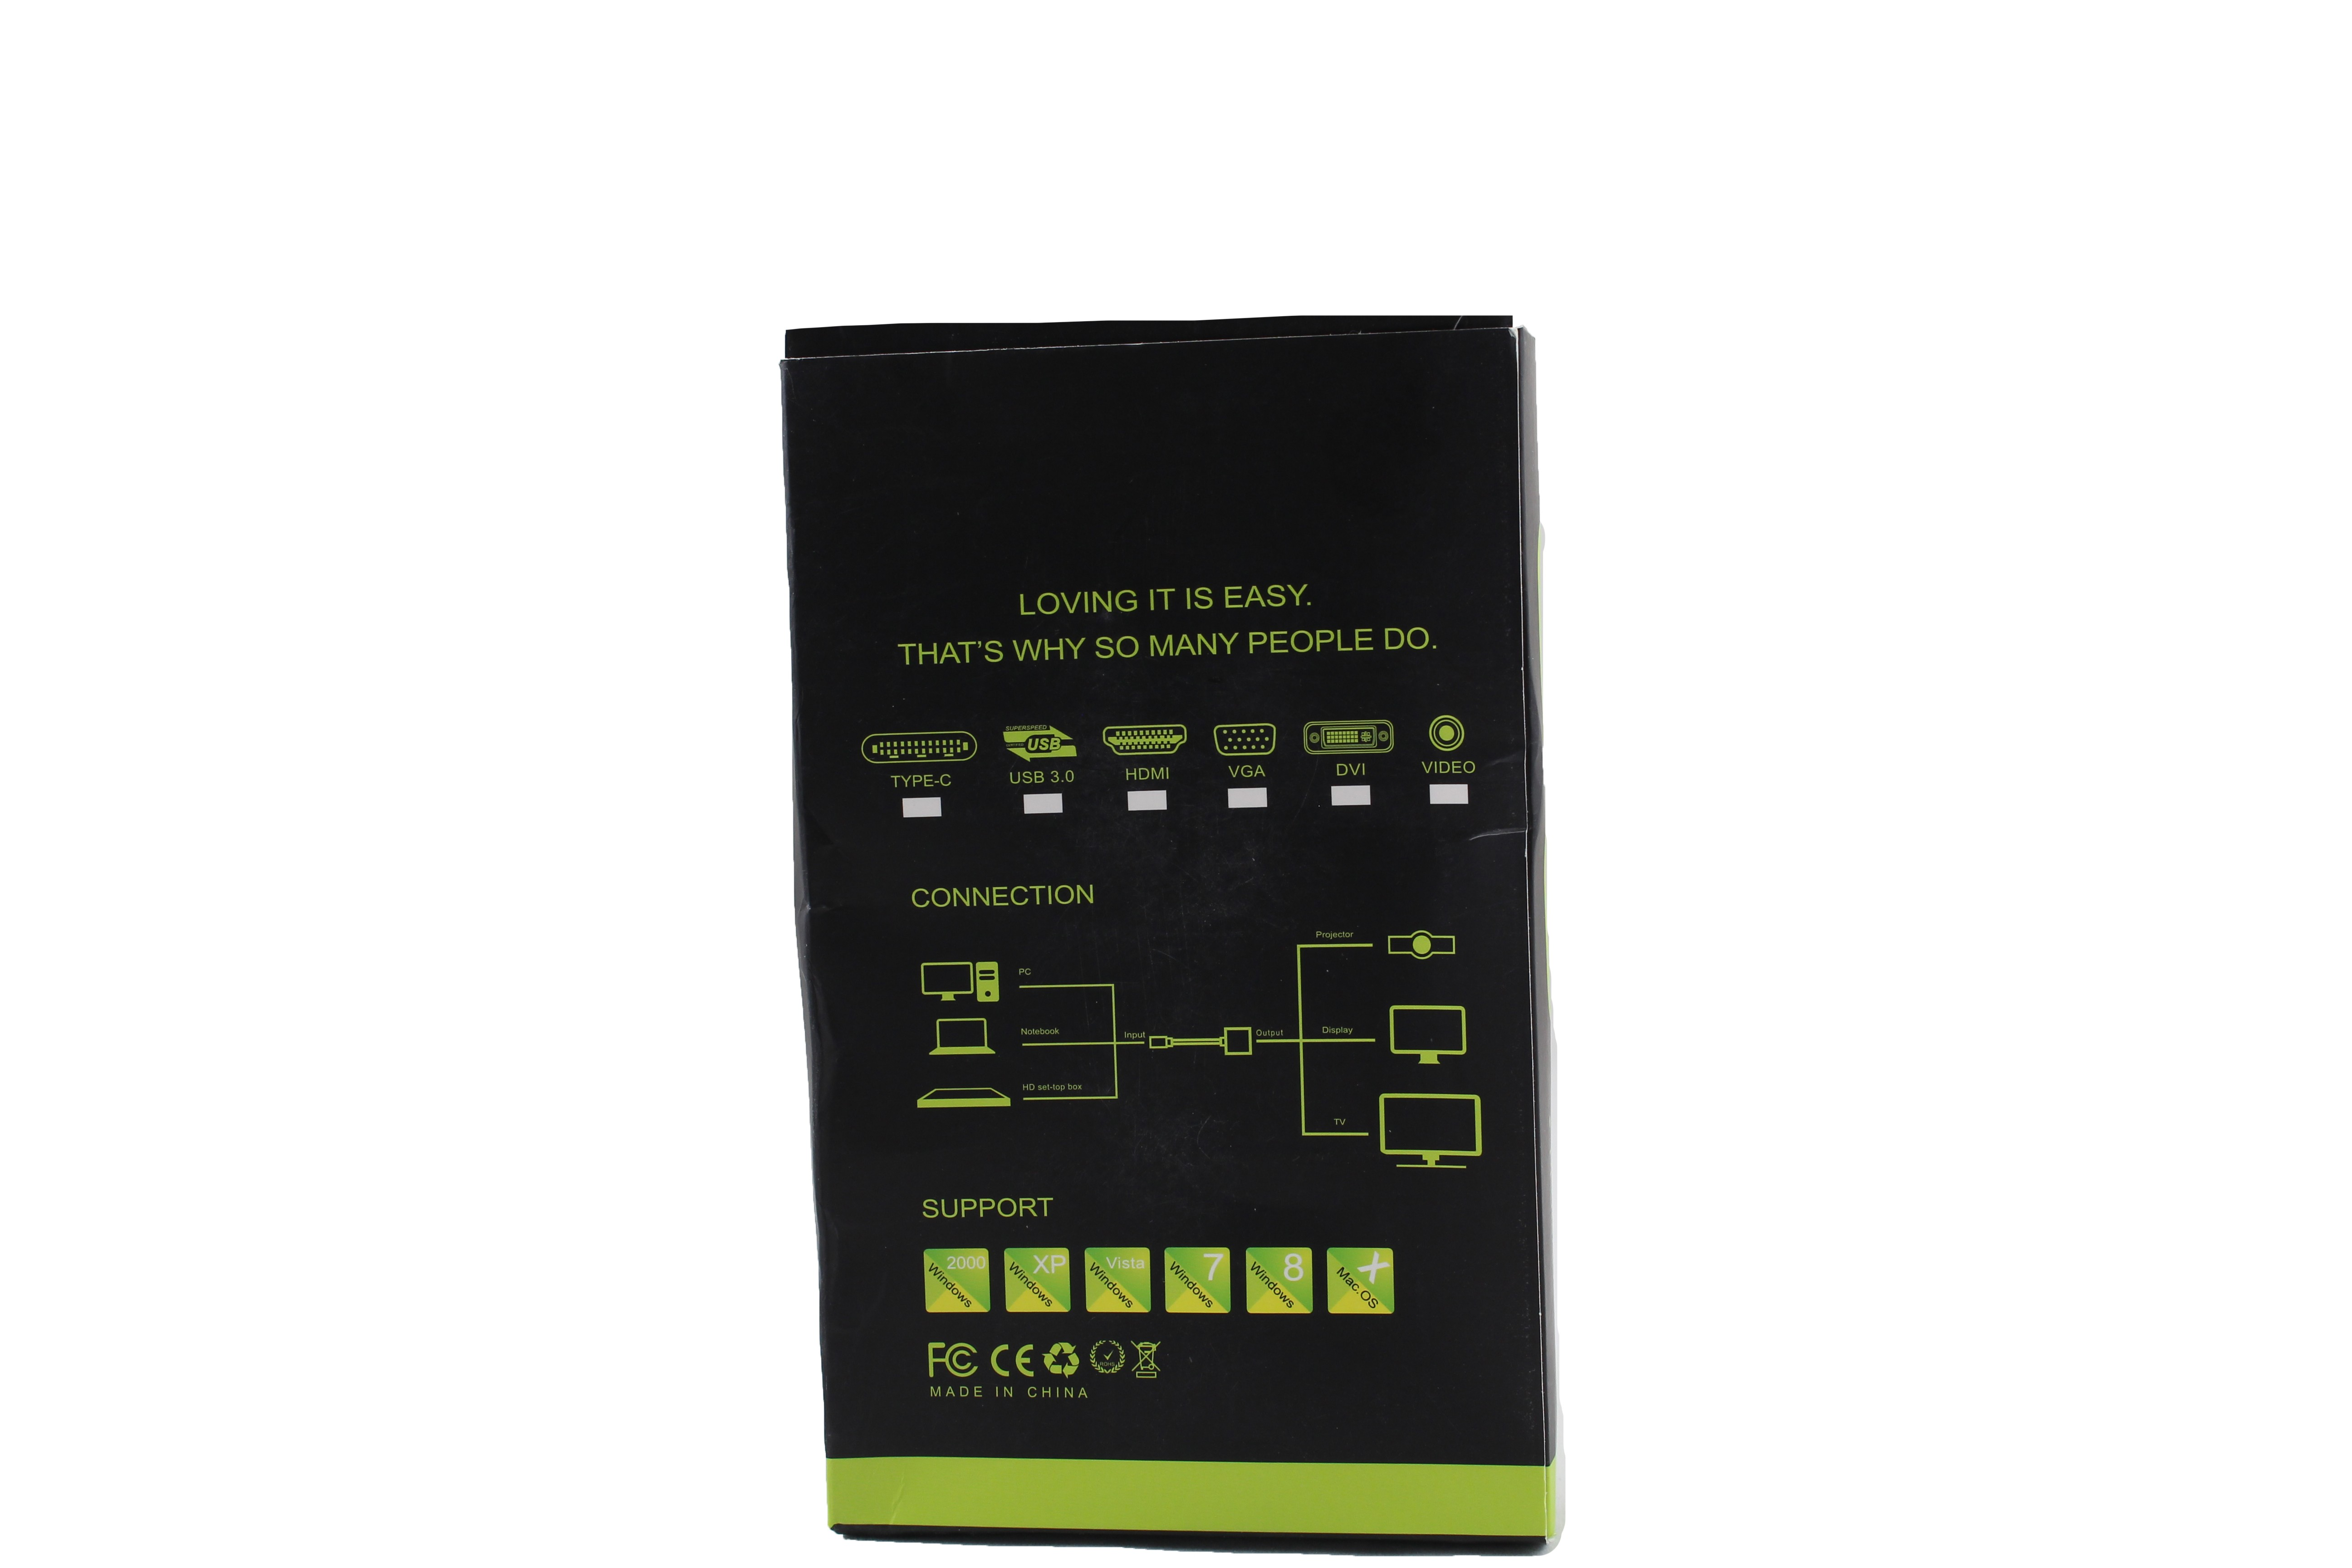 VGA към HDMI 1080P HD Audio TV AV HDTV видео кабел конвертор адаптер CA88 20